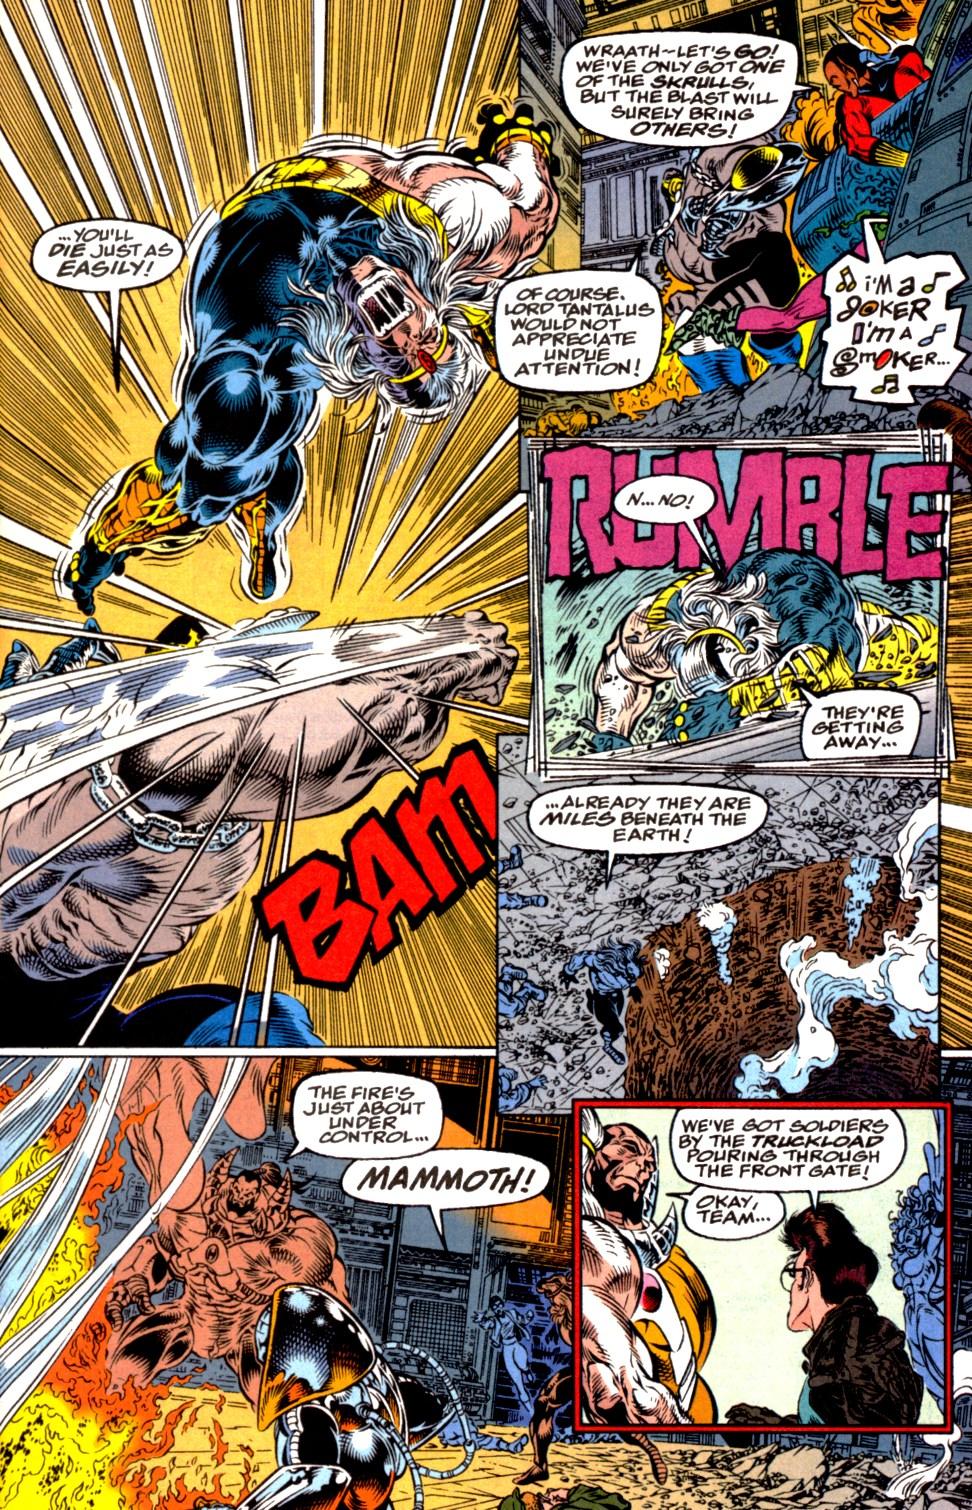 Read online Blackwulf comic -  Issue #2 - 21